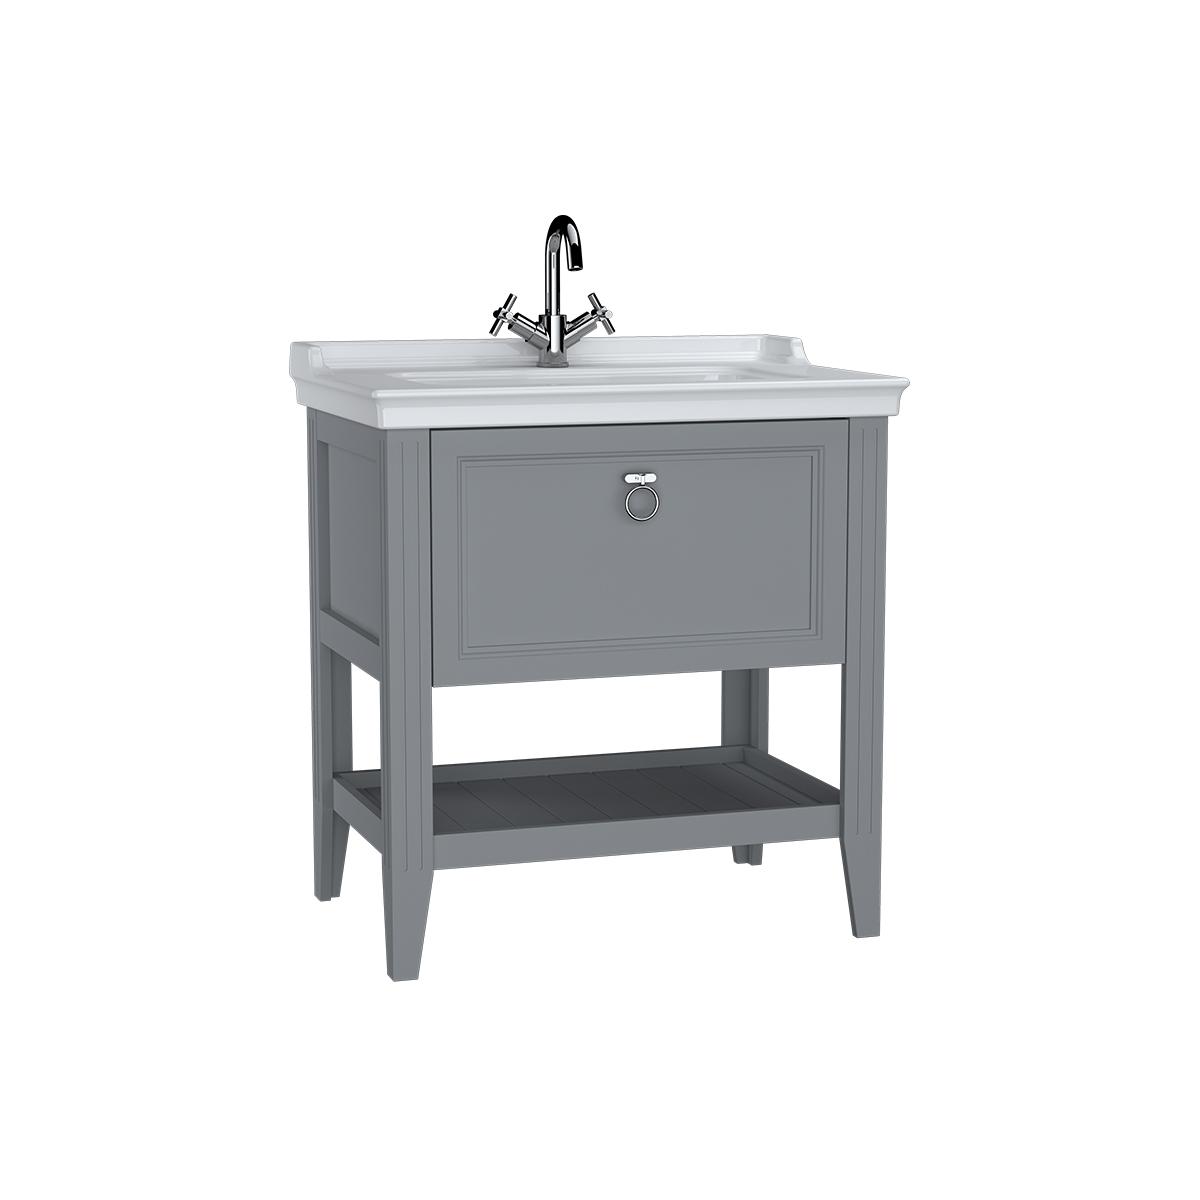 Valarte meuble avec plan céramique, 80 cm, avec tiror, gris mat